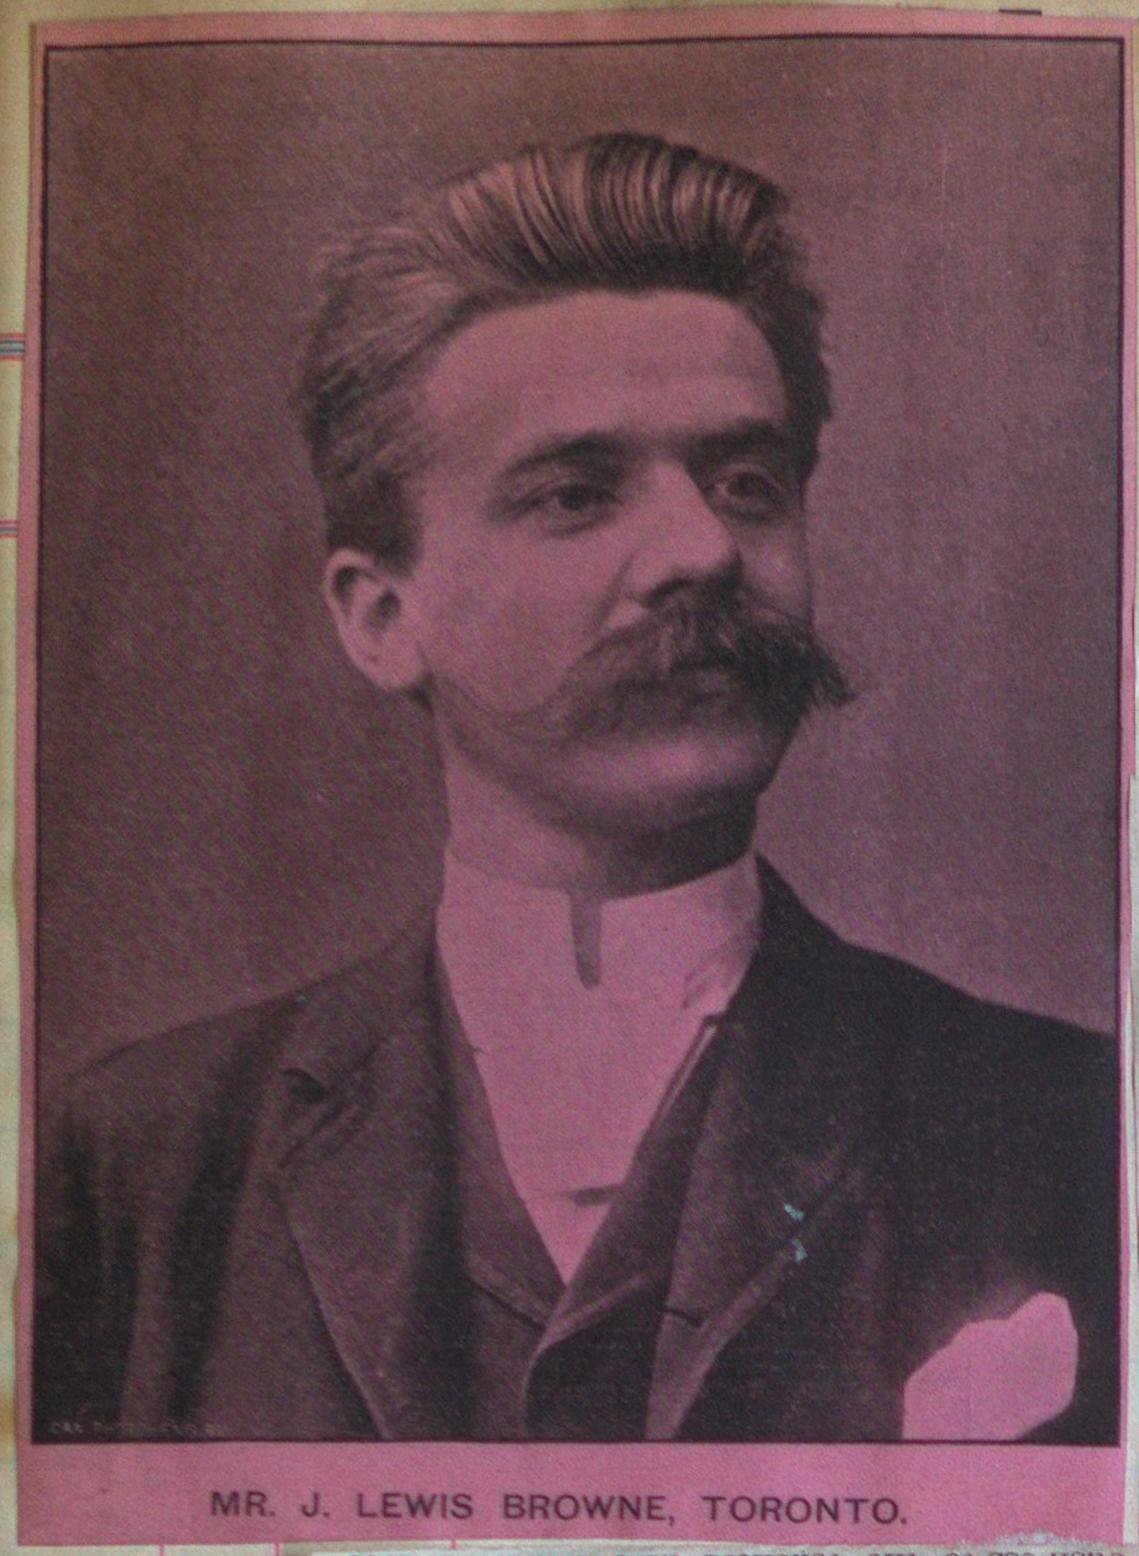 Teresa Vanderburgh's Musical Scrapbook #1 - Picture of Mr. J. Lewis Browne